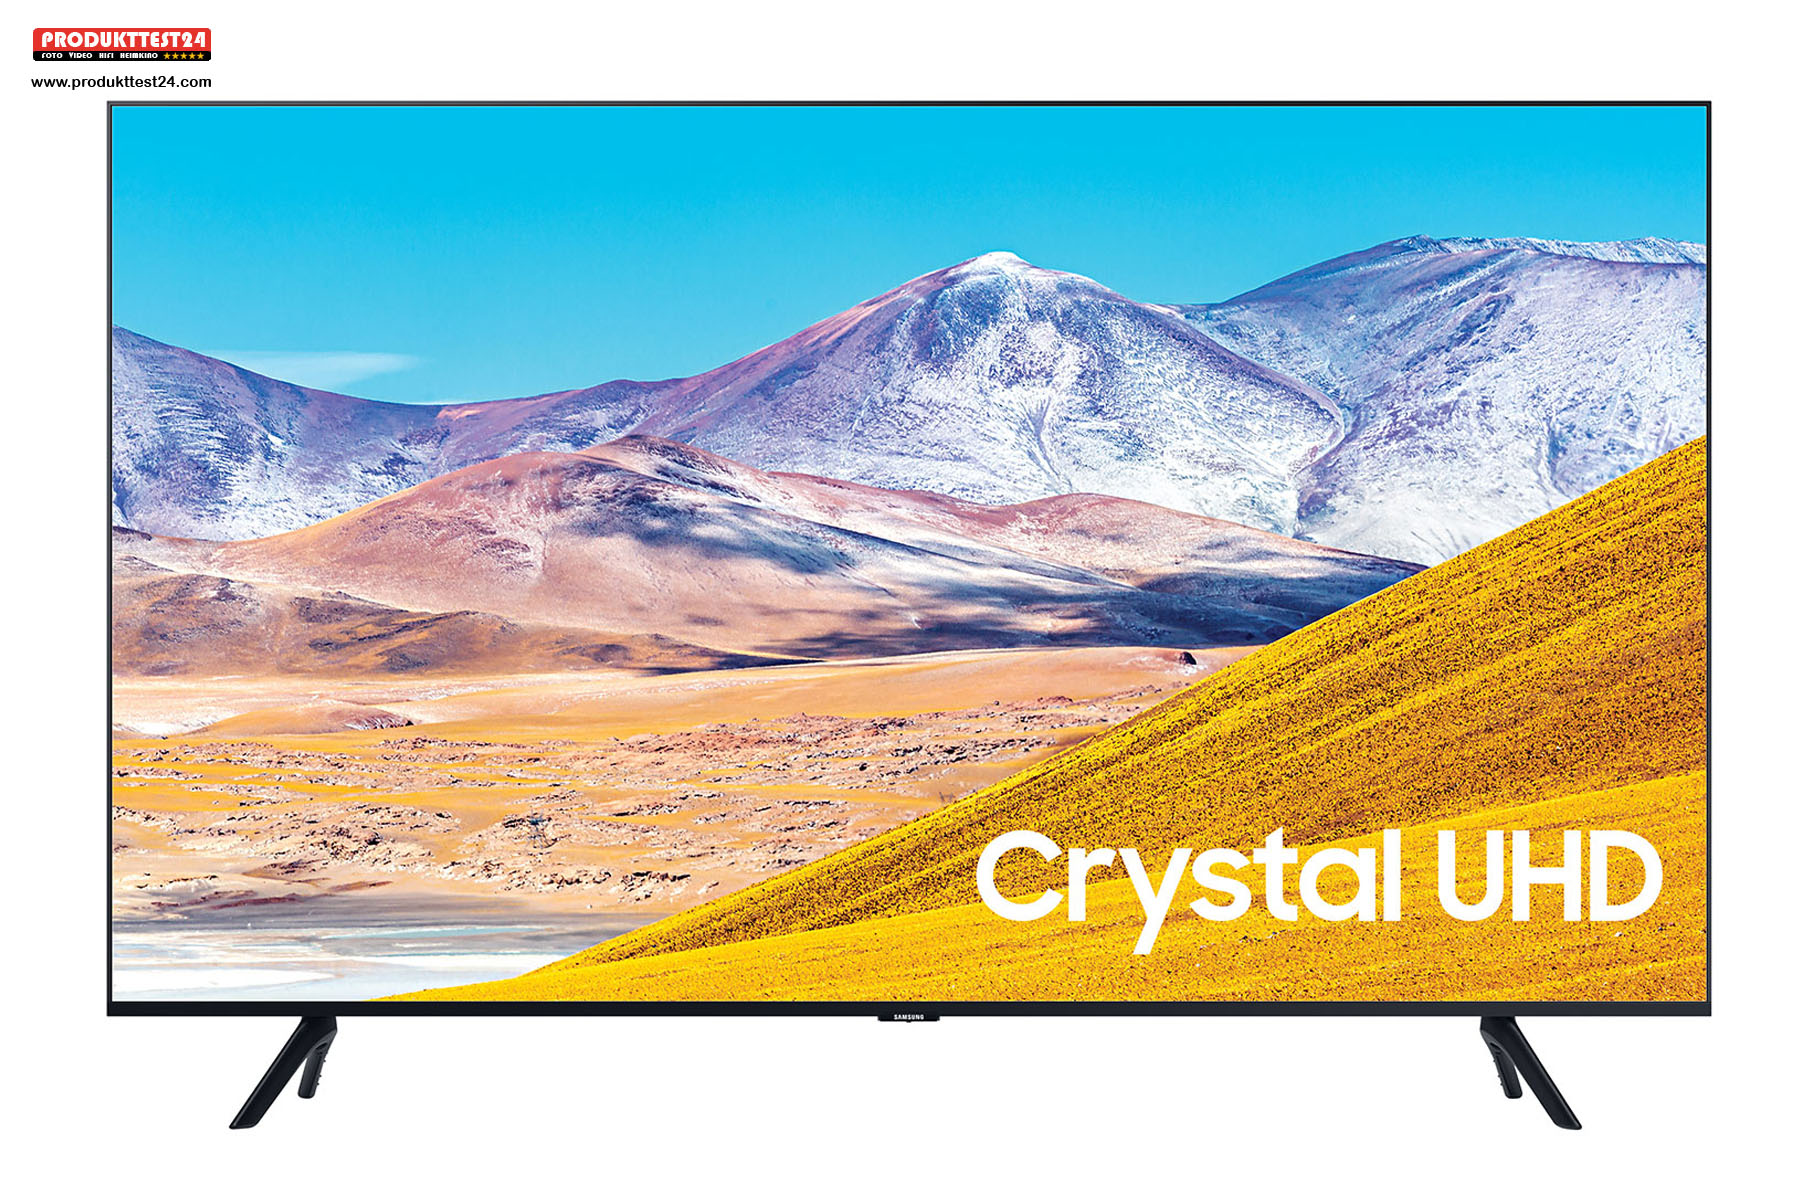 Samsung GU75TU8079 - 4K Ultra HD Auflösung, 189 cm (75 Zoll) Bilddiagonale, SmartTV und Triple Tuner